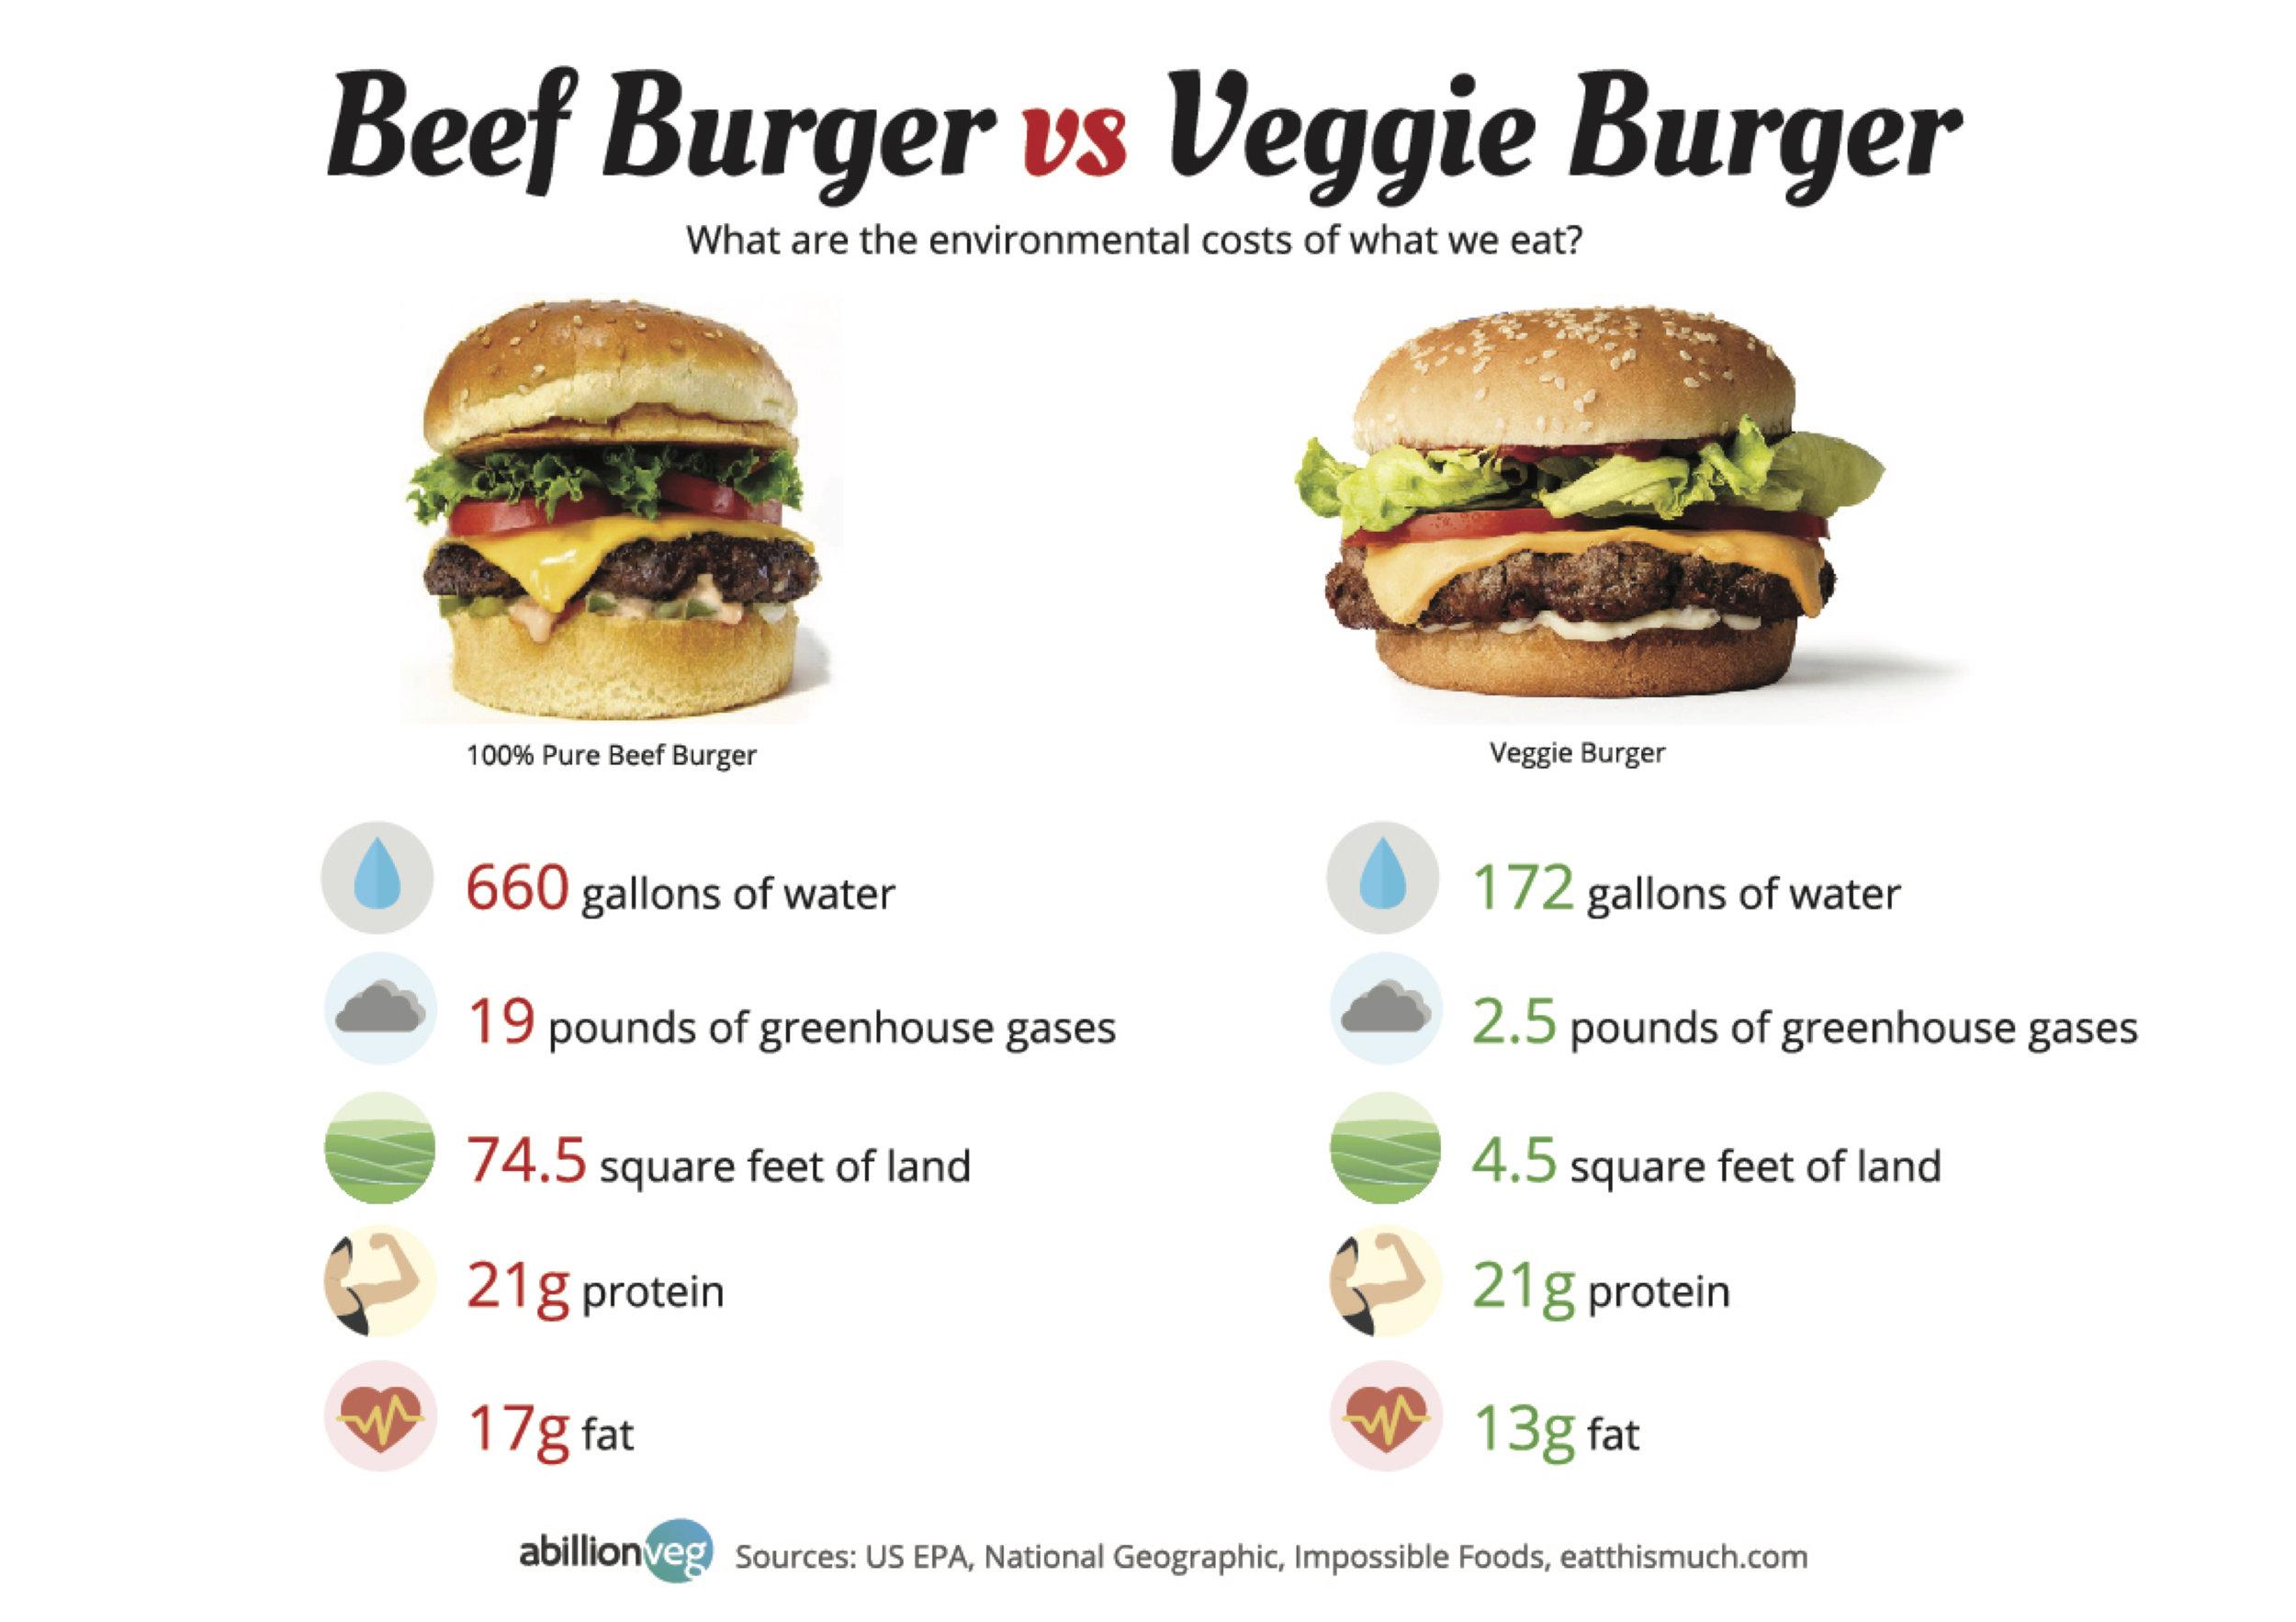 Beef burger vs Veggies burger.jpg